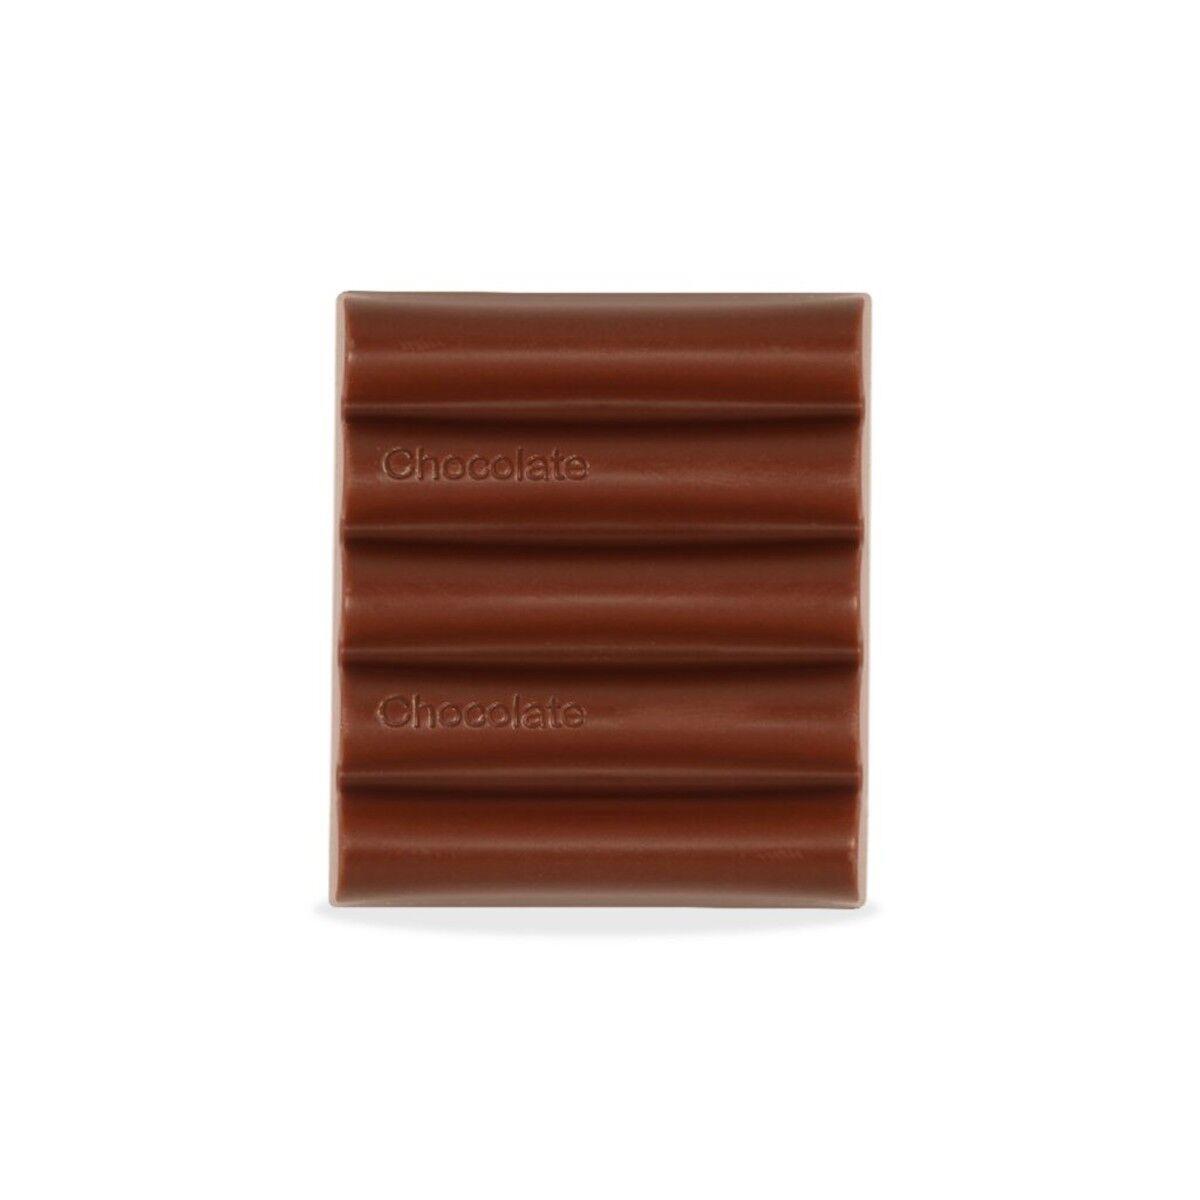 Eco Friendly 6 Bar Chocolate